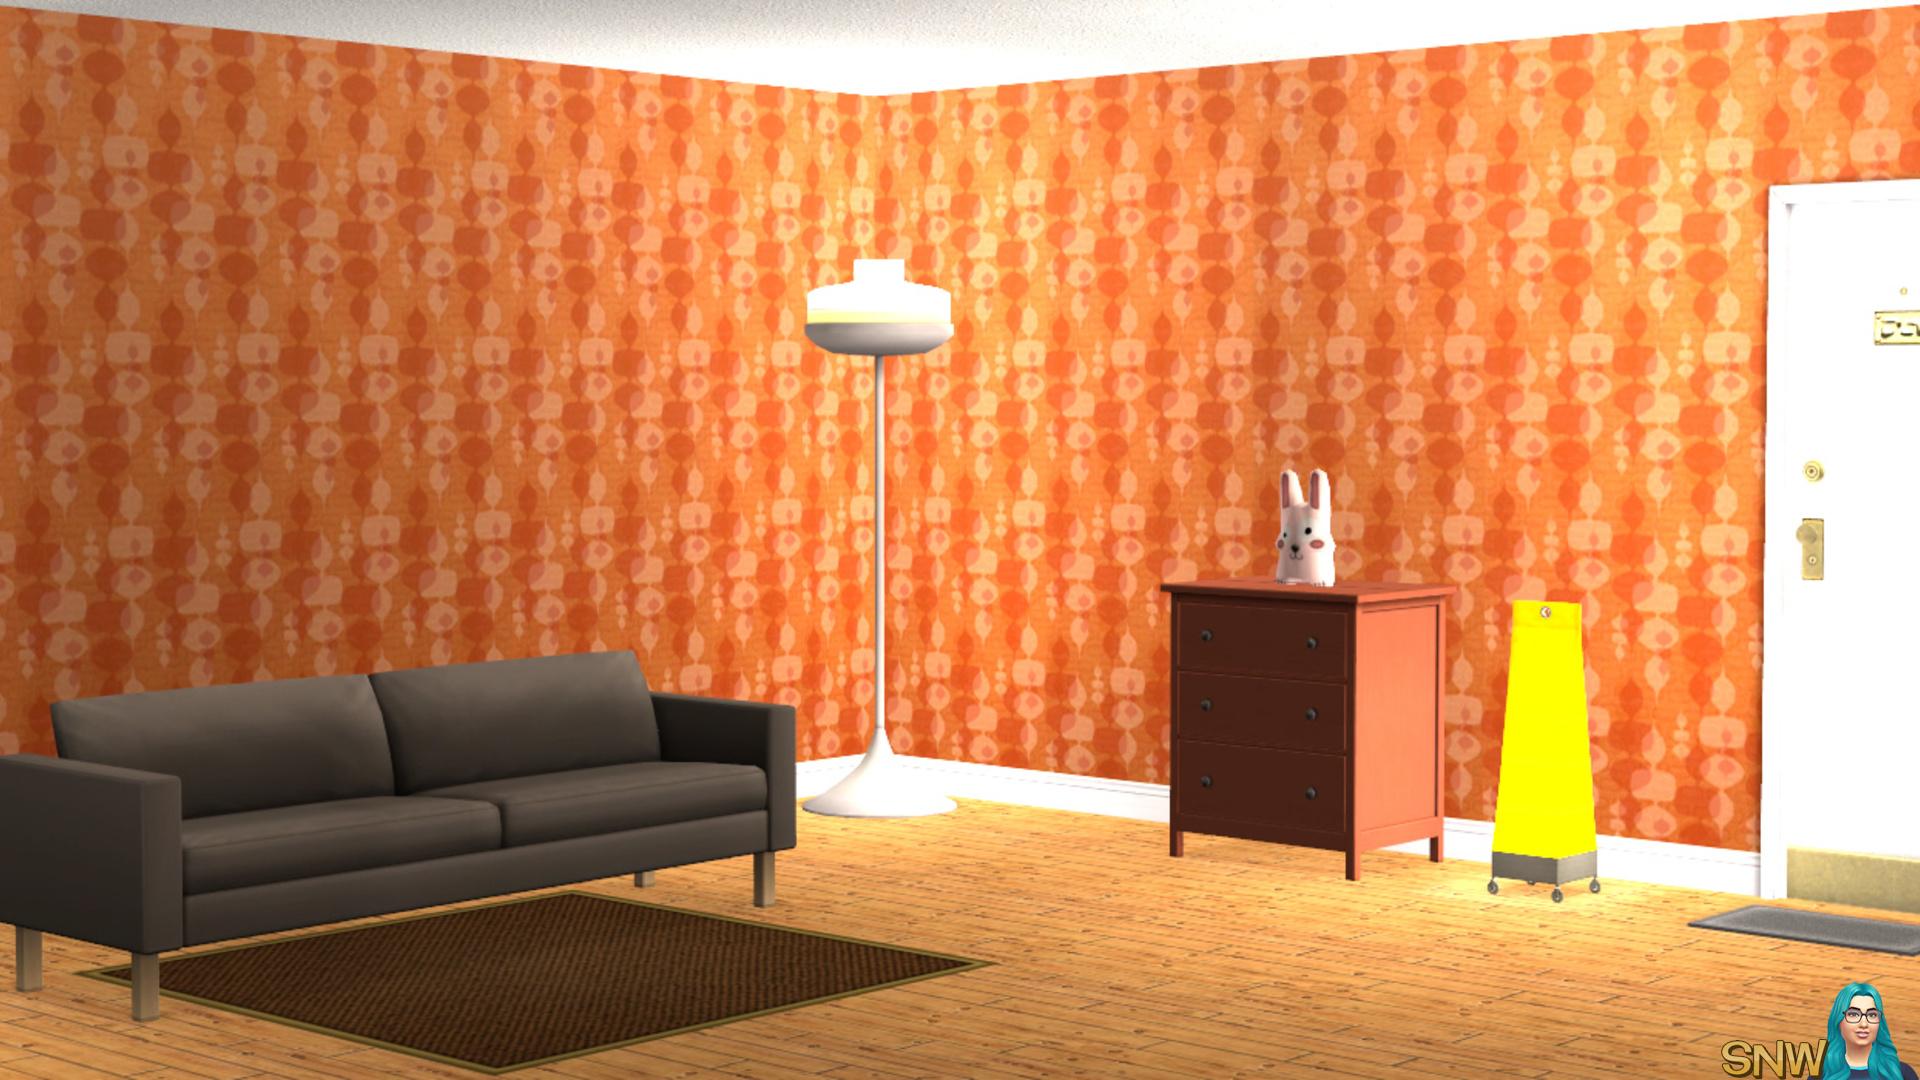 Mod wallpaper orange & red